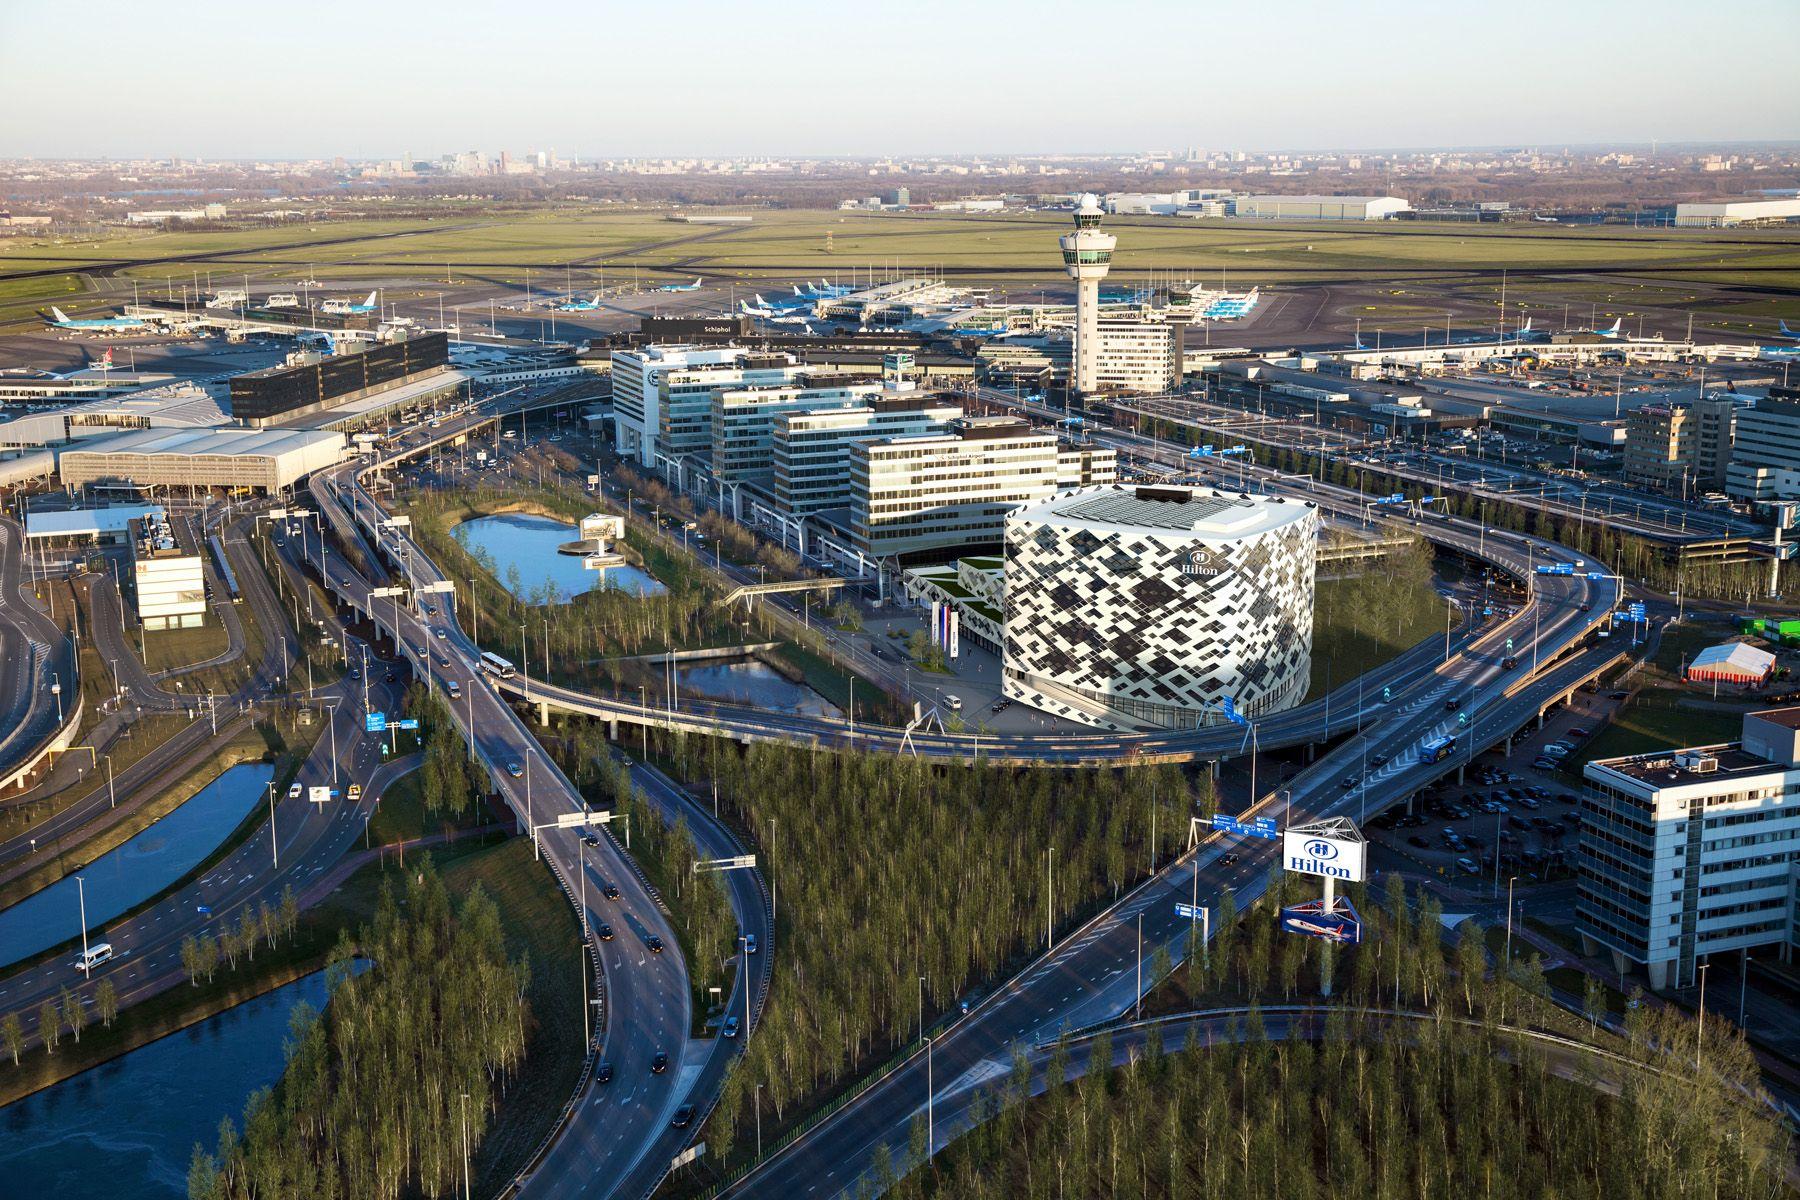 Airport Hotel Amsterdam Schiphol